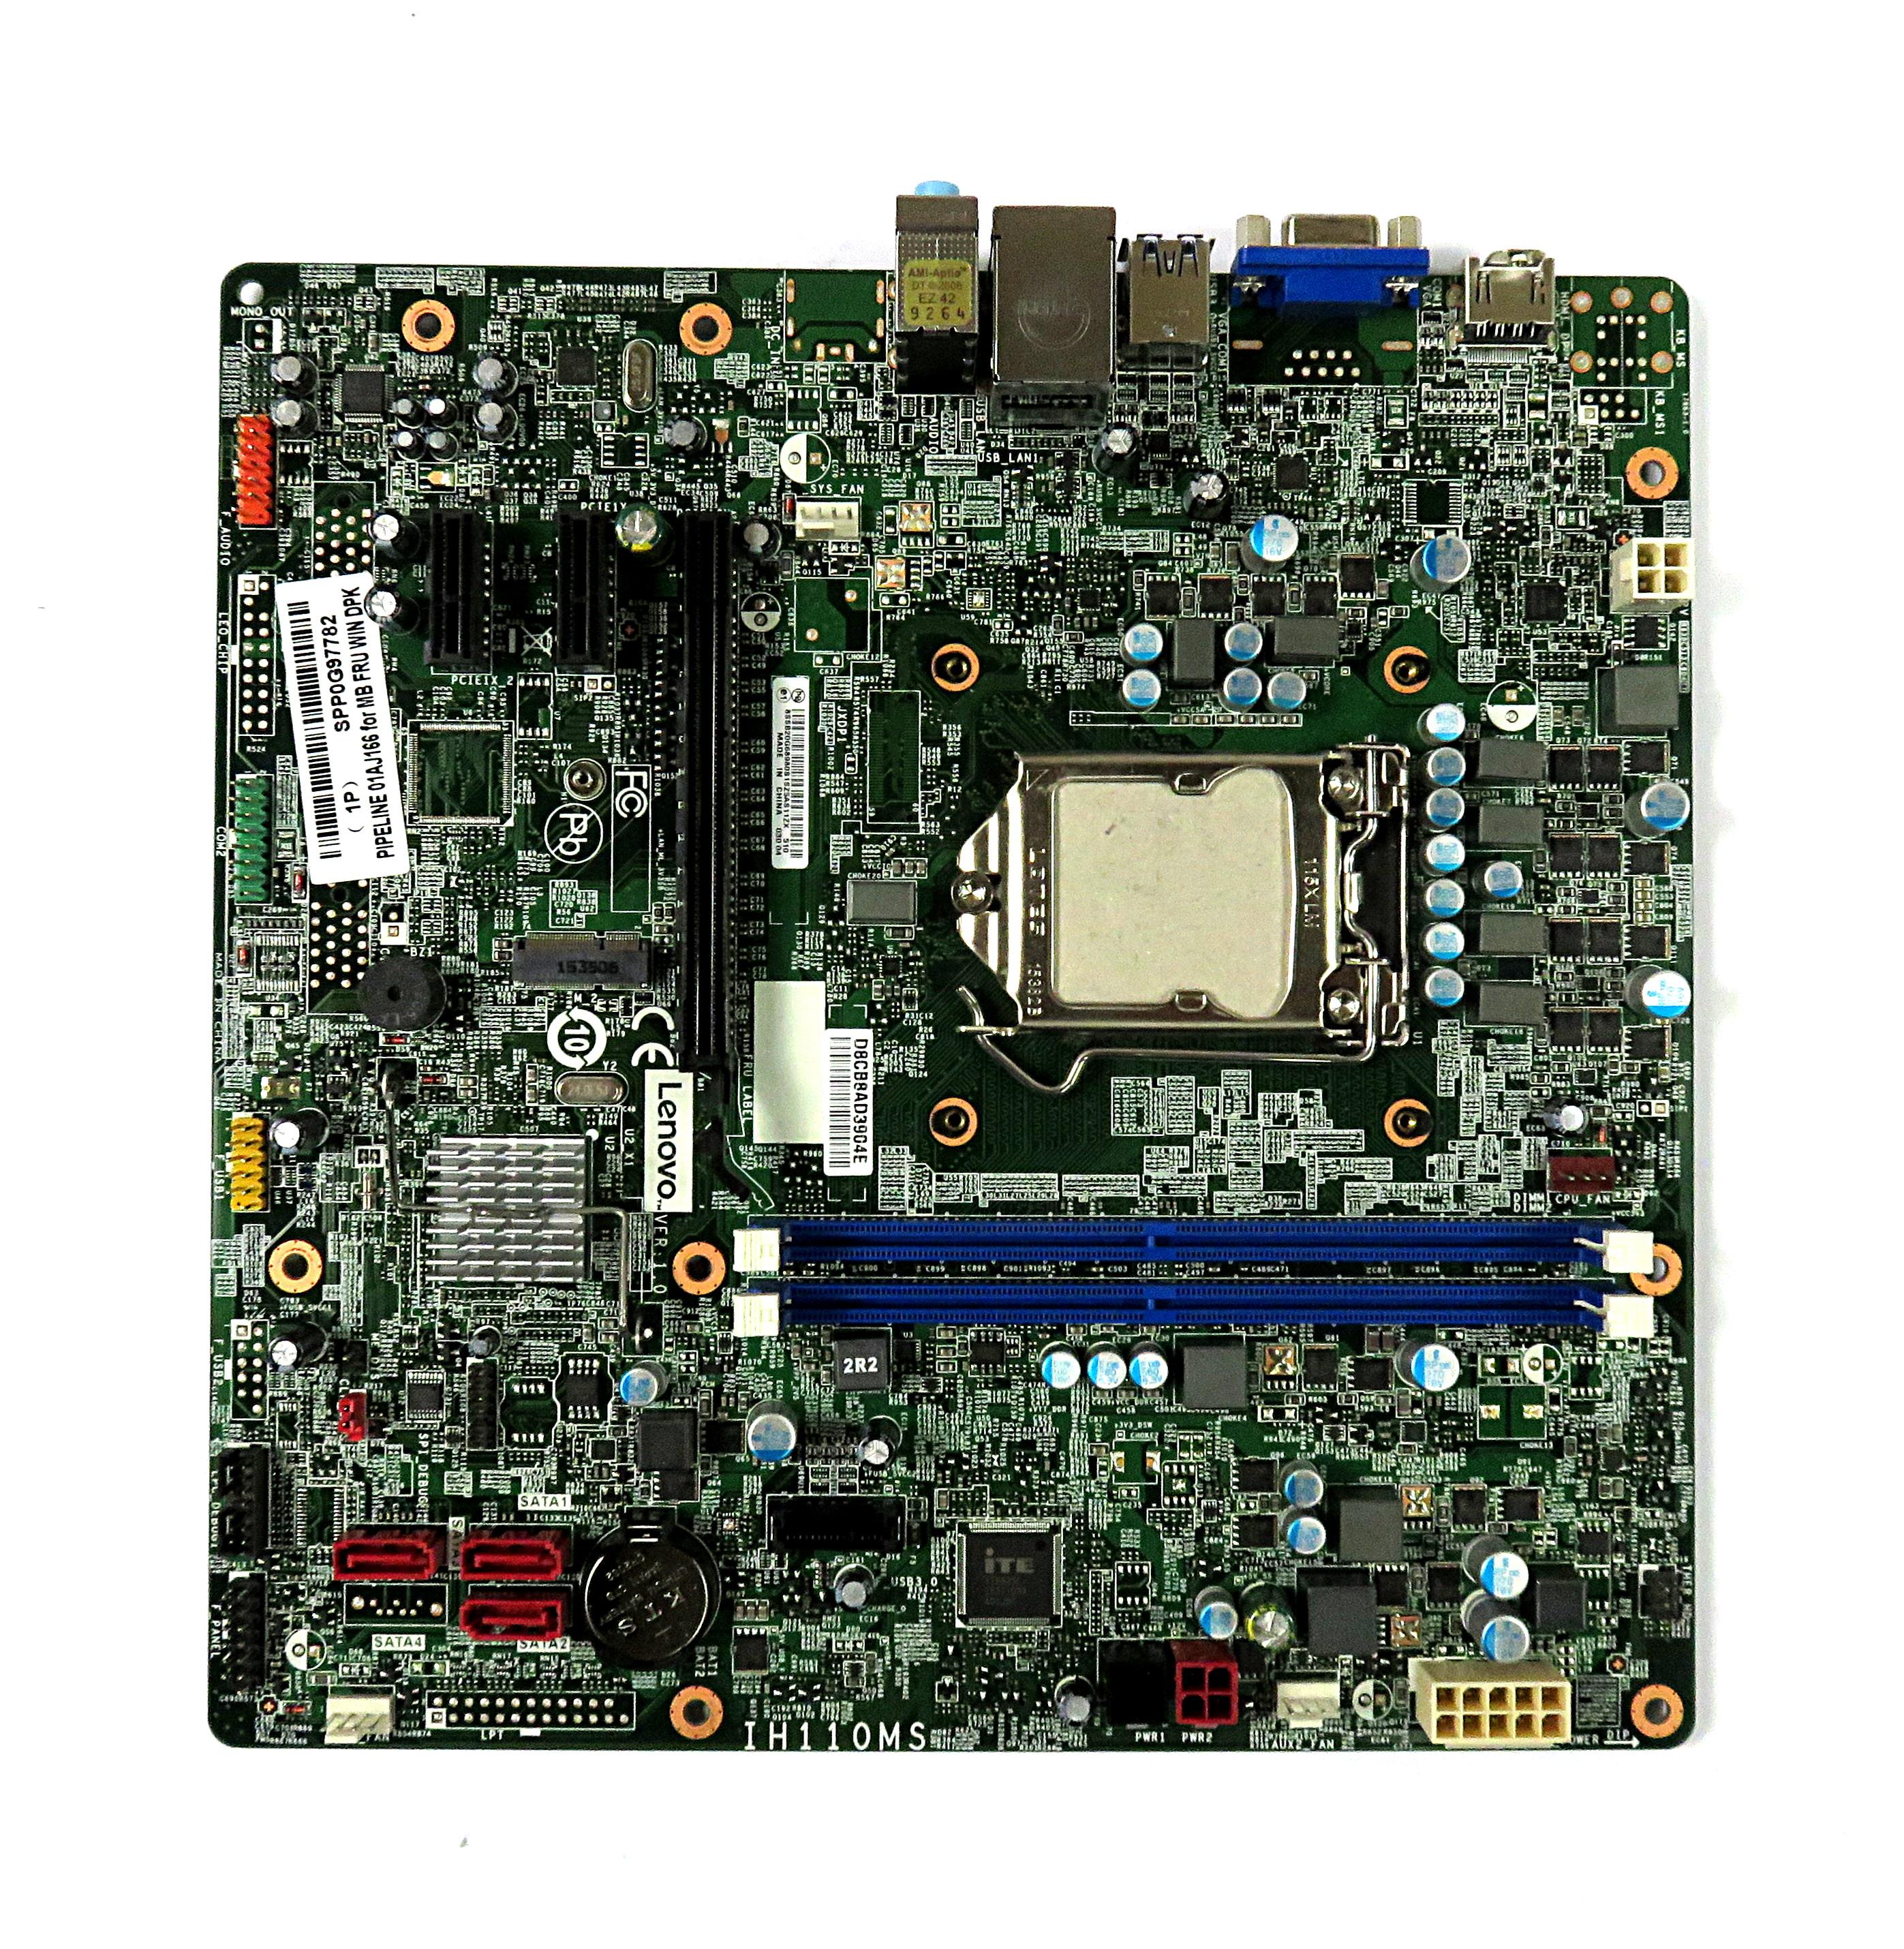 01AJ166 Lenovo Socket LGA1151 Motherboard IH110MS f/ ideacentre 300-11ISH